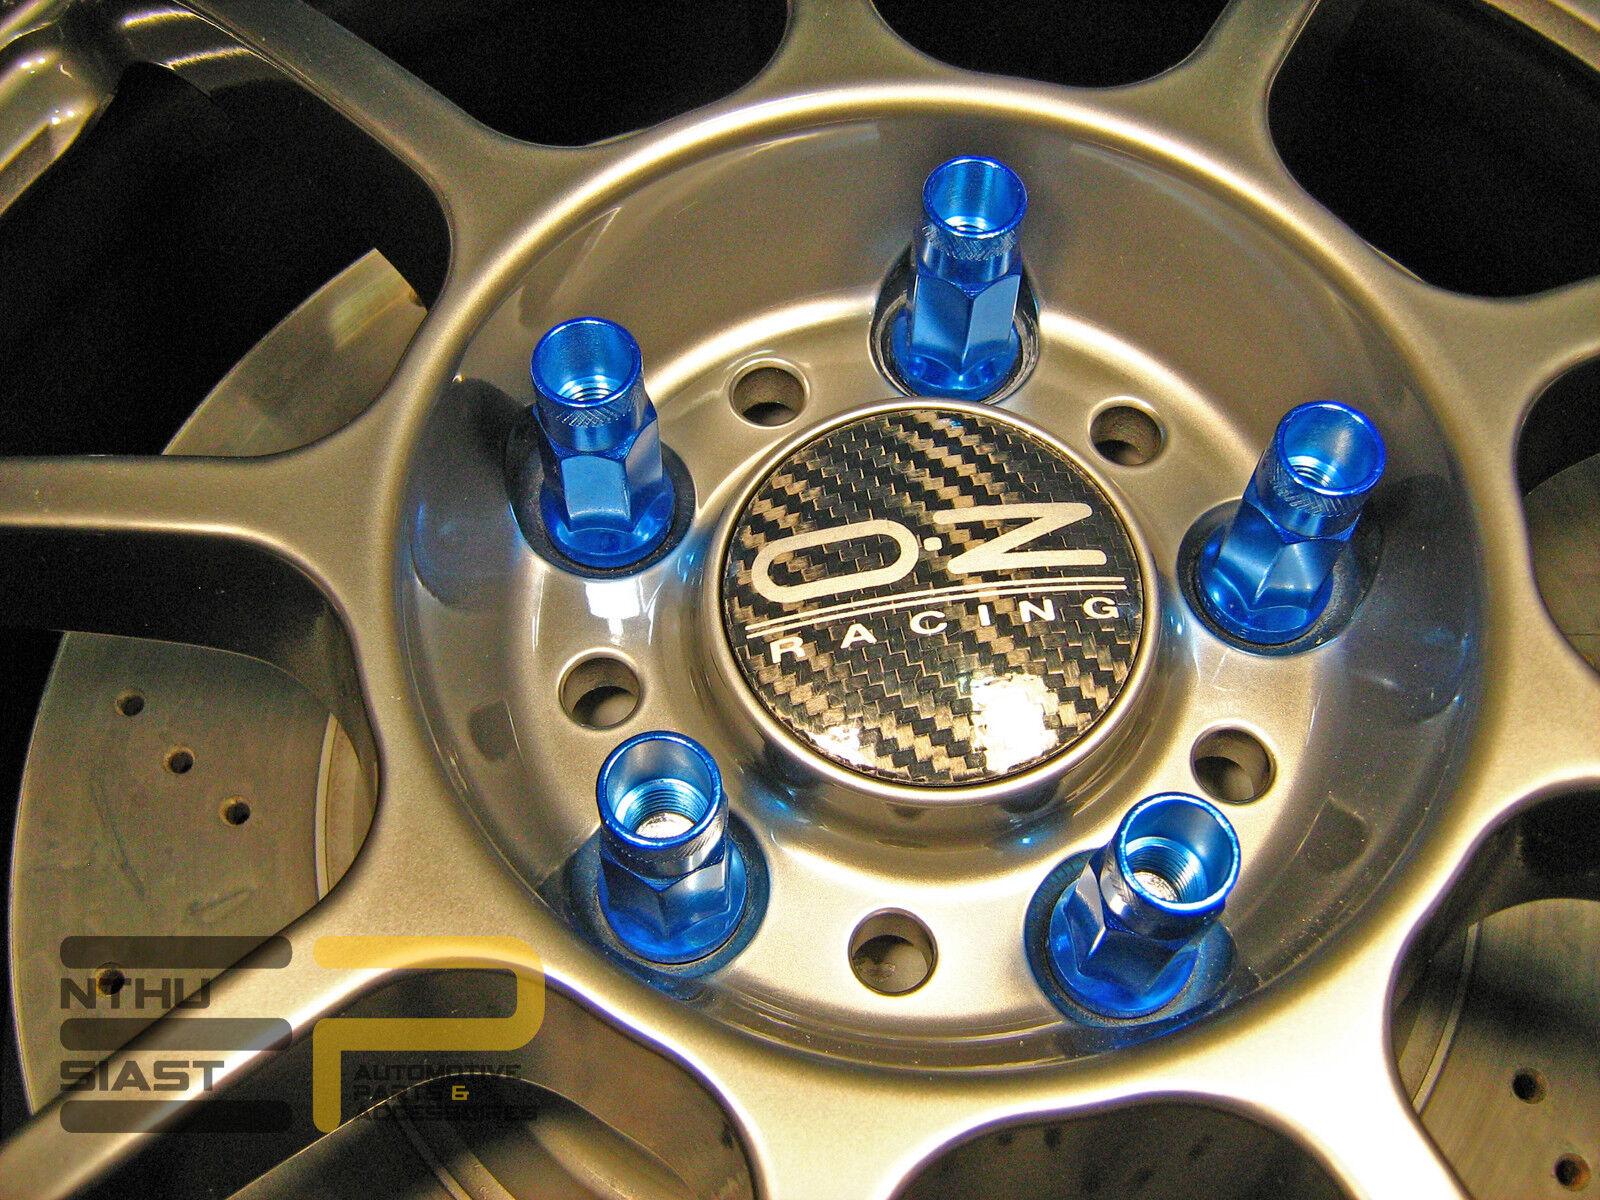 dpPerformance Lug Nuts Stahl M12x1,25 Radmuttern Neo Chrom Nissan Subaru Suzuki Japan JDM